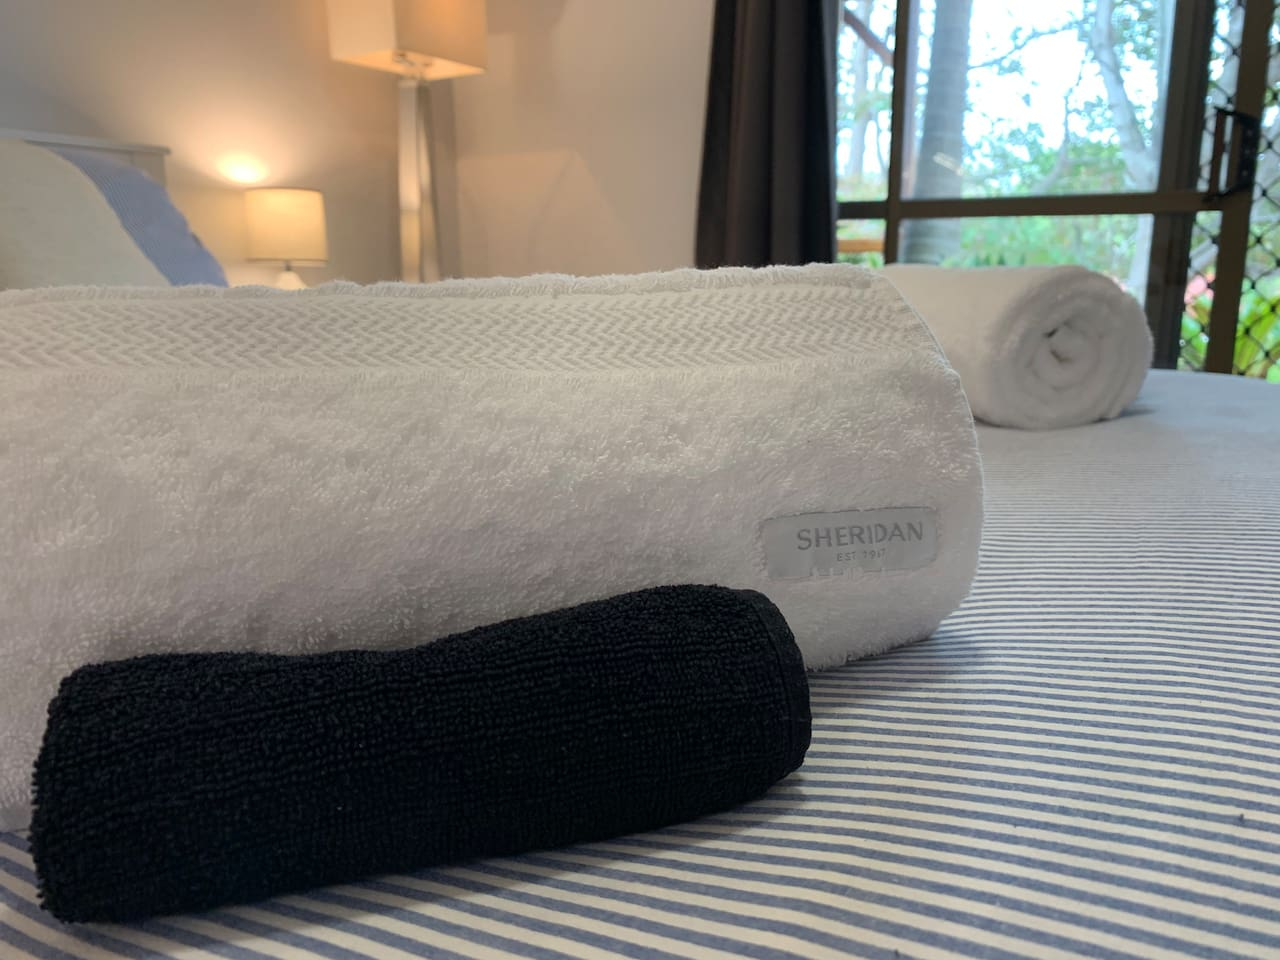 Hotel grade linen and Sheridan towels for premium comfort.